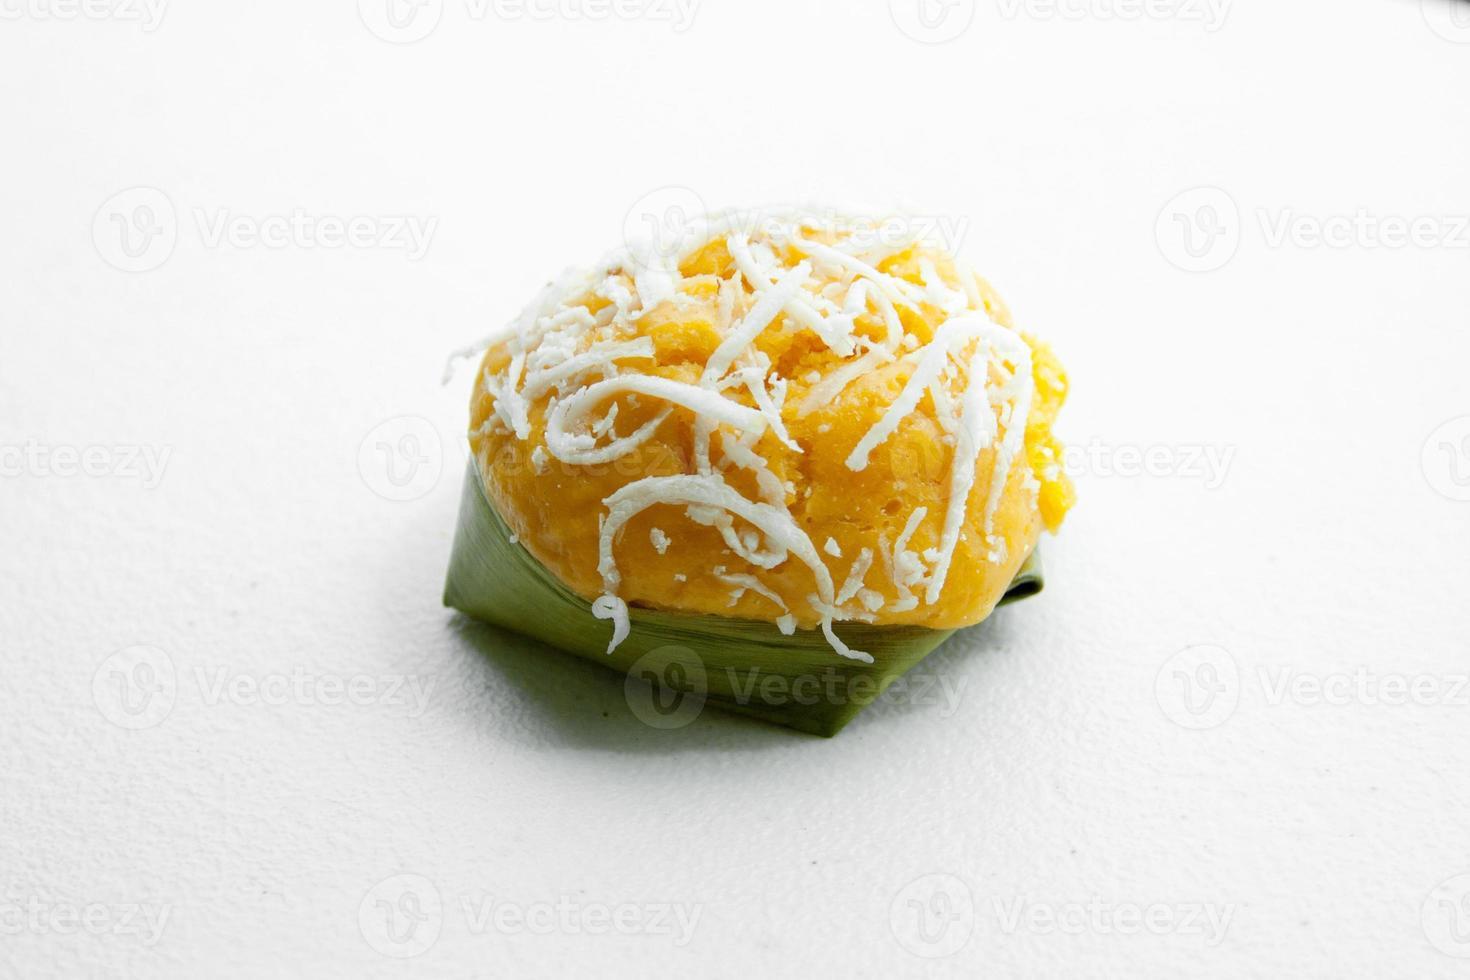 postre tailandés dulce pastel de palma de azúcar con coco foto